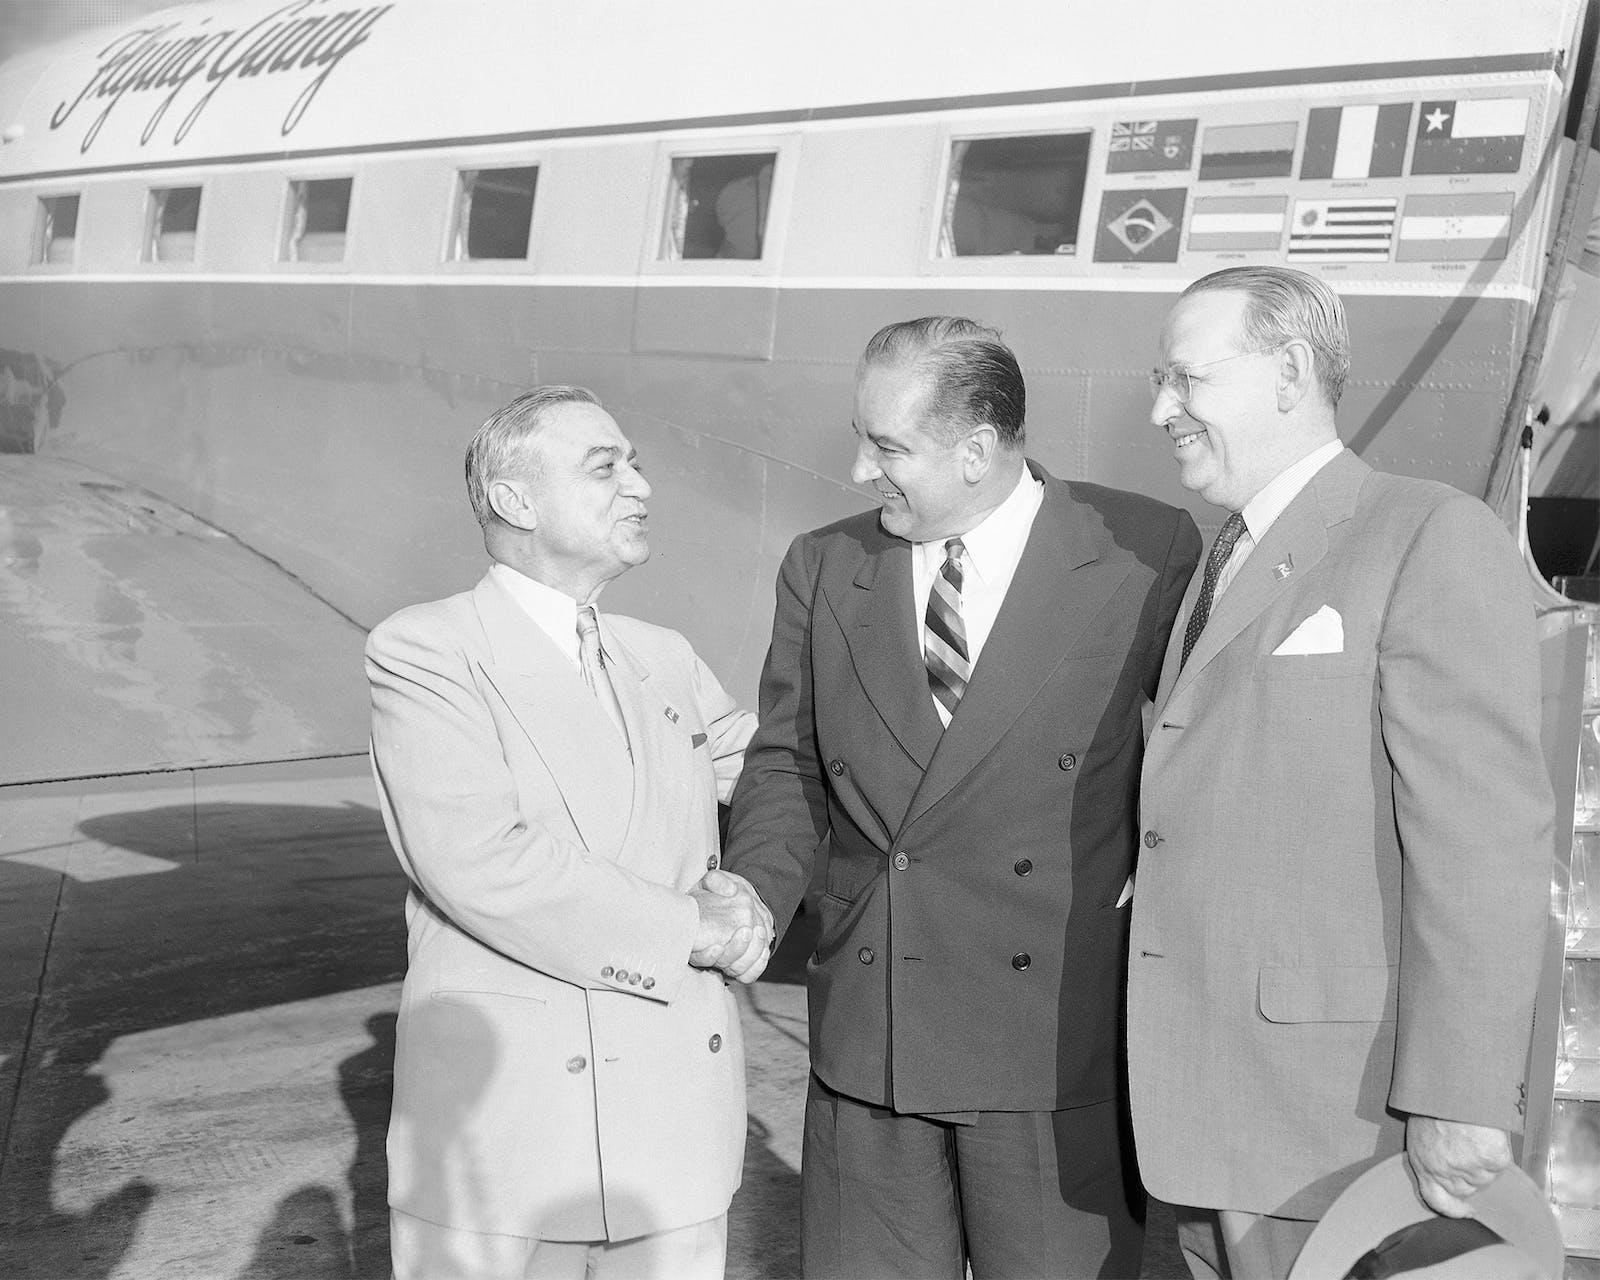 Houston oil man R.H. Abercrombie, left, and Houston banker William A. Smith, right, greet Sen. Joseph McCarthy in Houston on April 20, 1954.